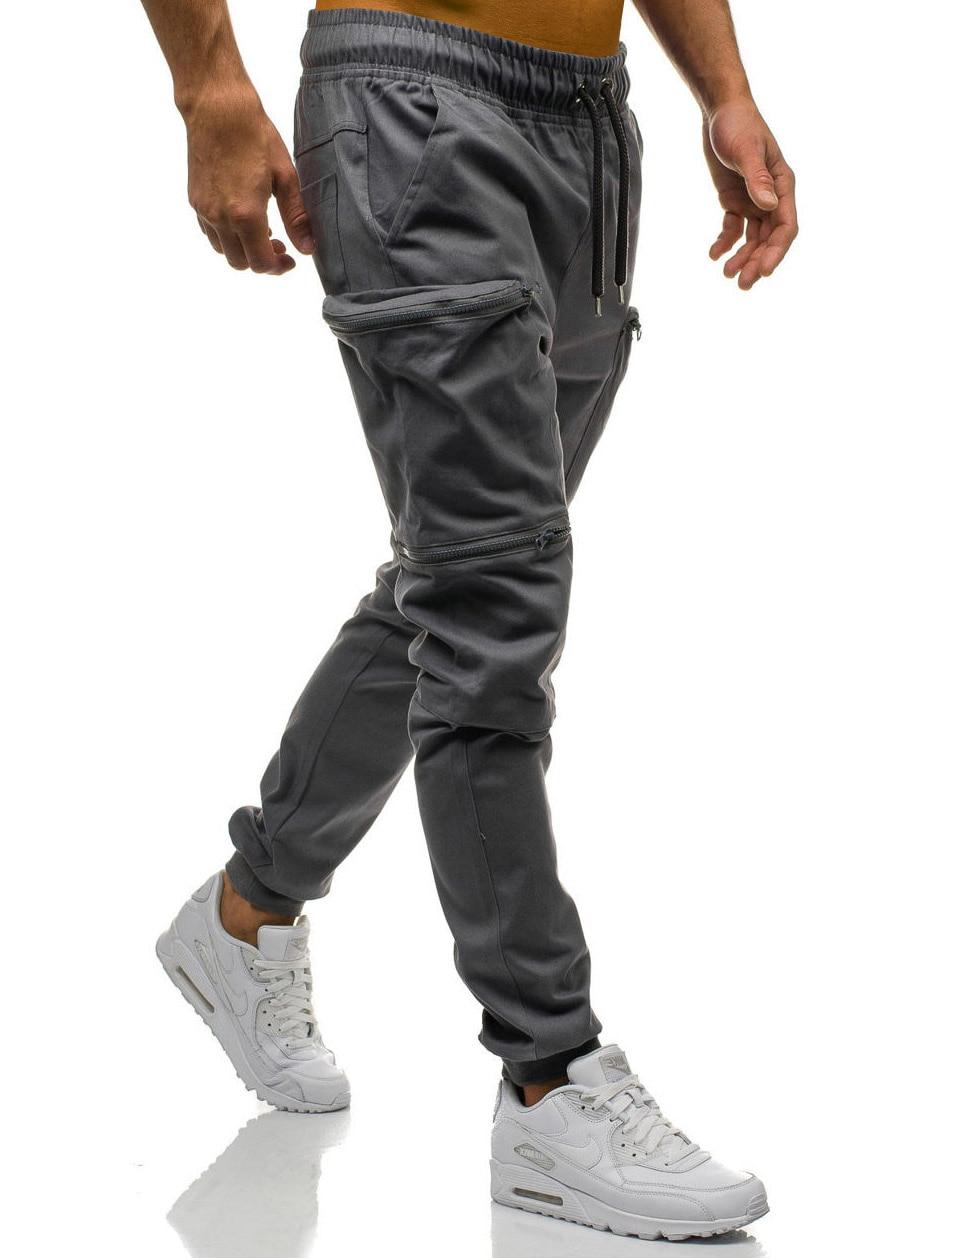 HTB1zRYiL7zoK1RjSZFlq6yi4VXaM Mens Joggers 2019 New Red Camouflage Multi-Pockets Cargo Pants Men Cotton Harem Pants Hip Hop Trousers Streetwear XXXL